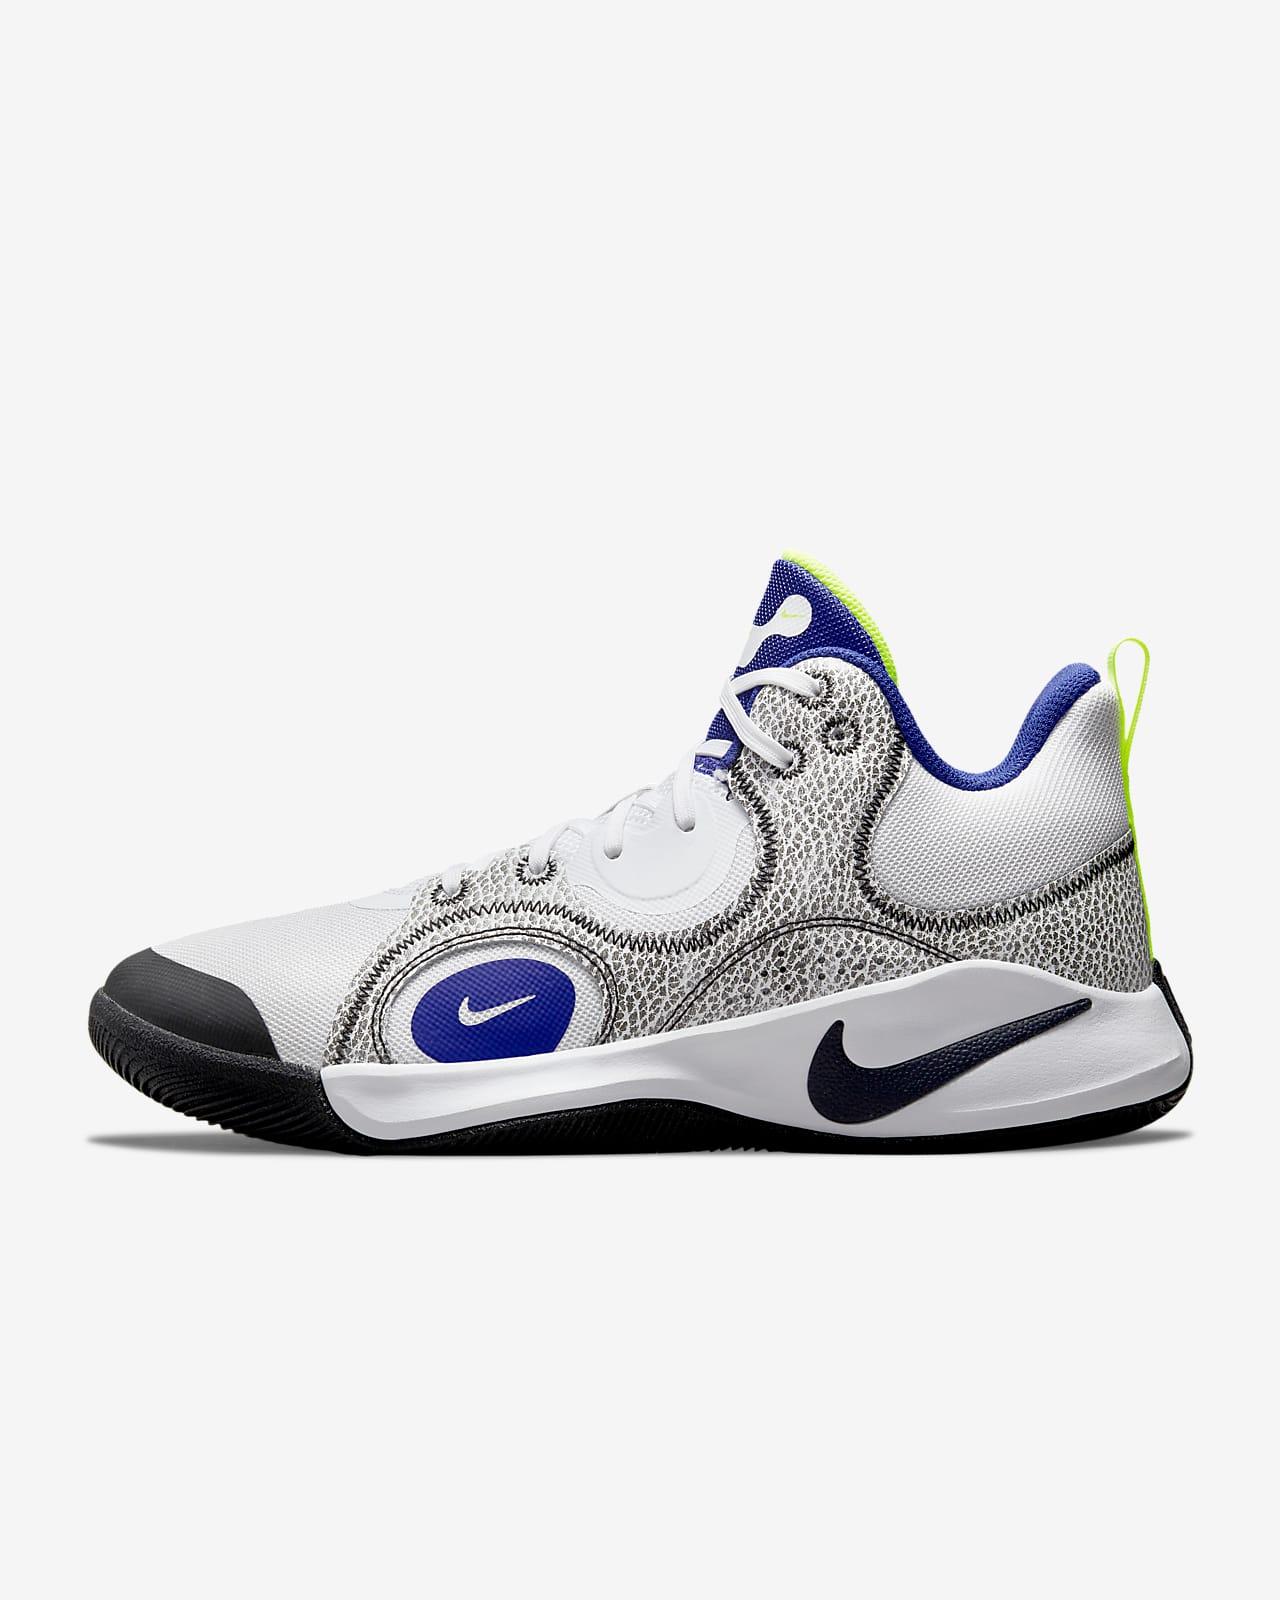 Calzado de básquetbol Nike Fly.By Mid 2